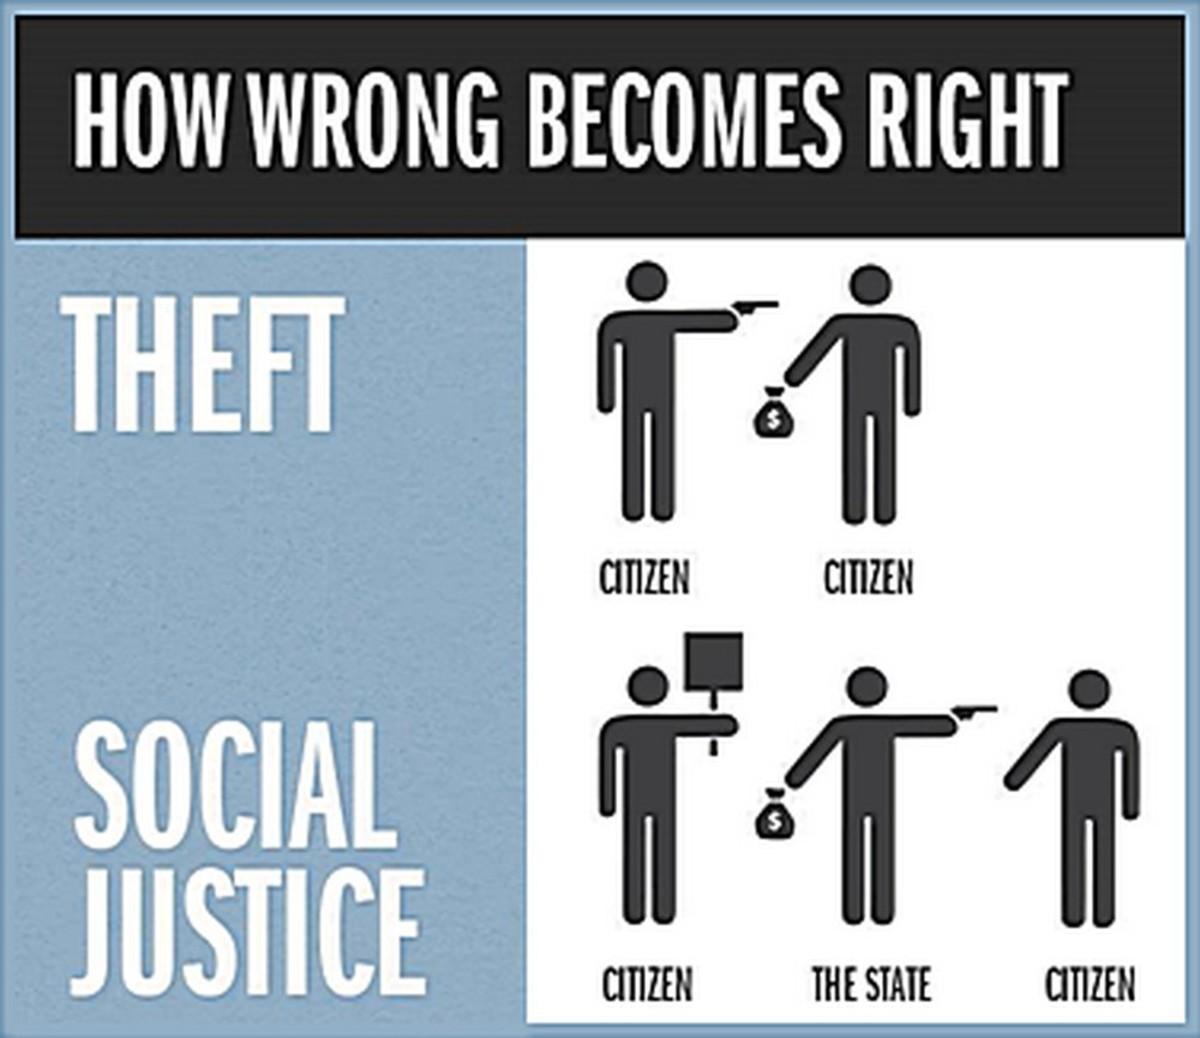 """Social Justice"" is Orwellian Doublespeak for ""theft"""